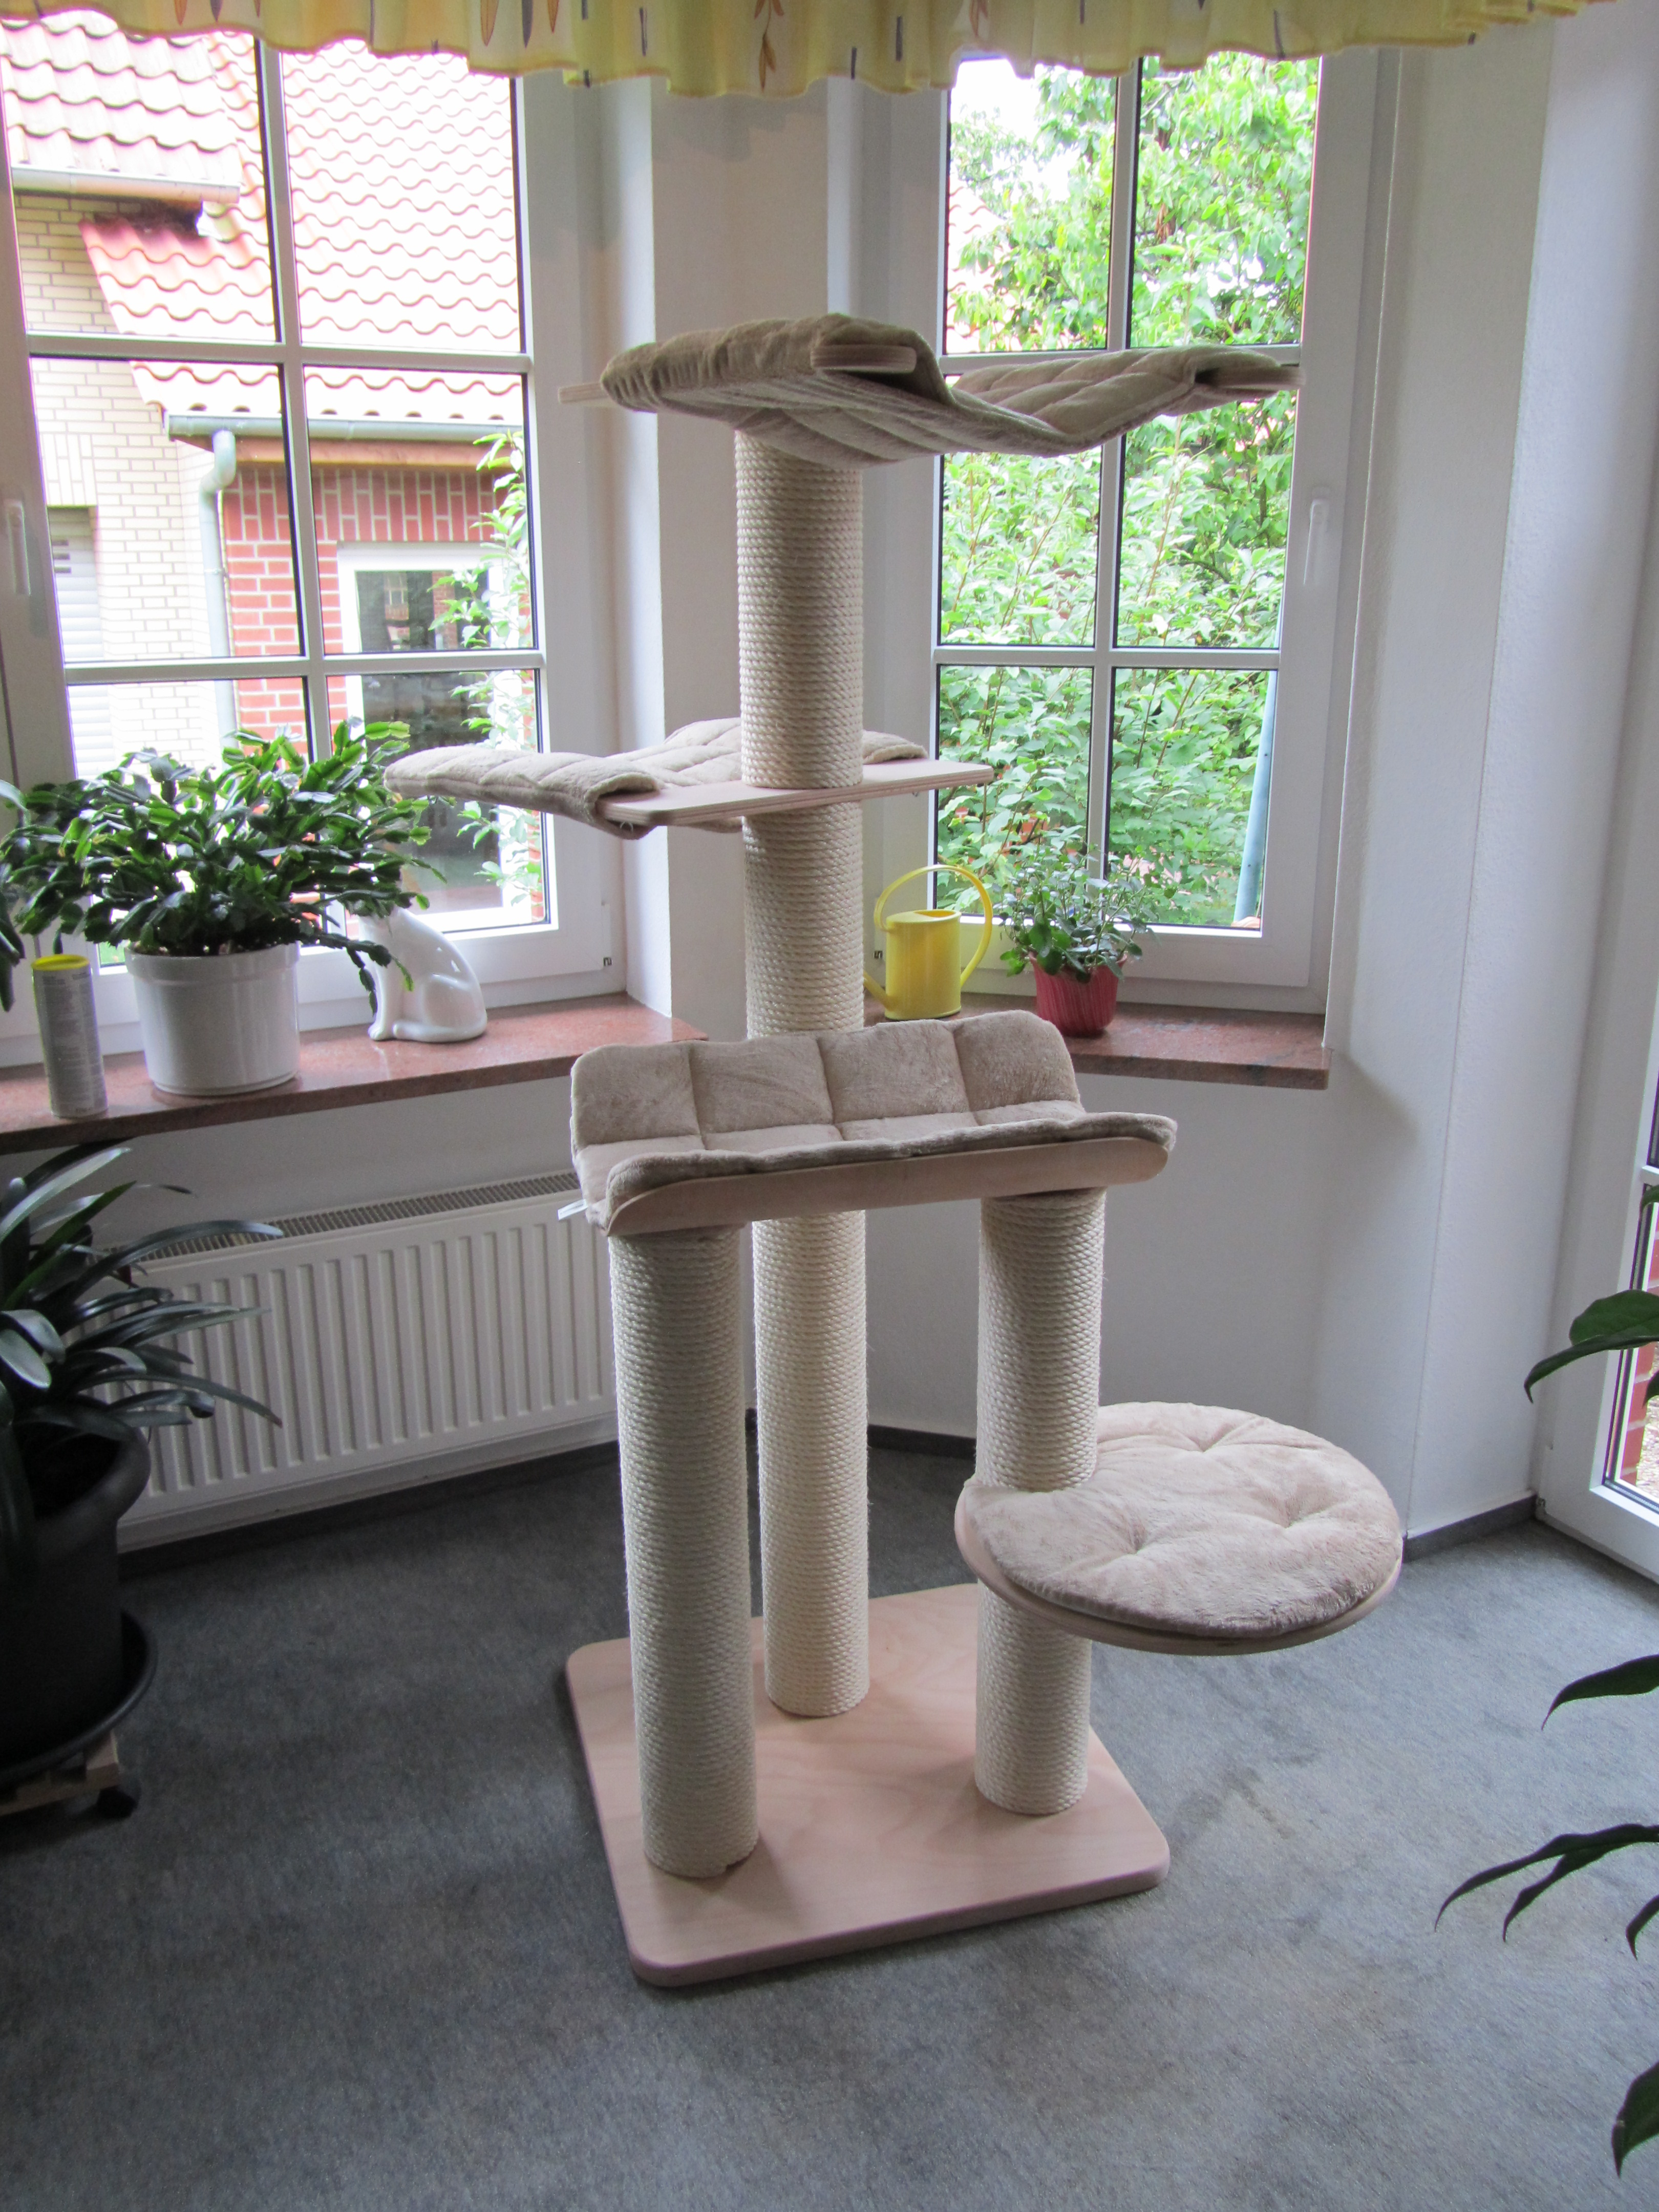 kirstins heimtier shop kratzbaum m4 07. Black Bedroom Furniture Sets. Home Design Ideas